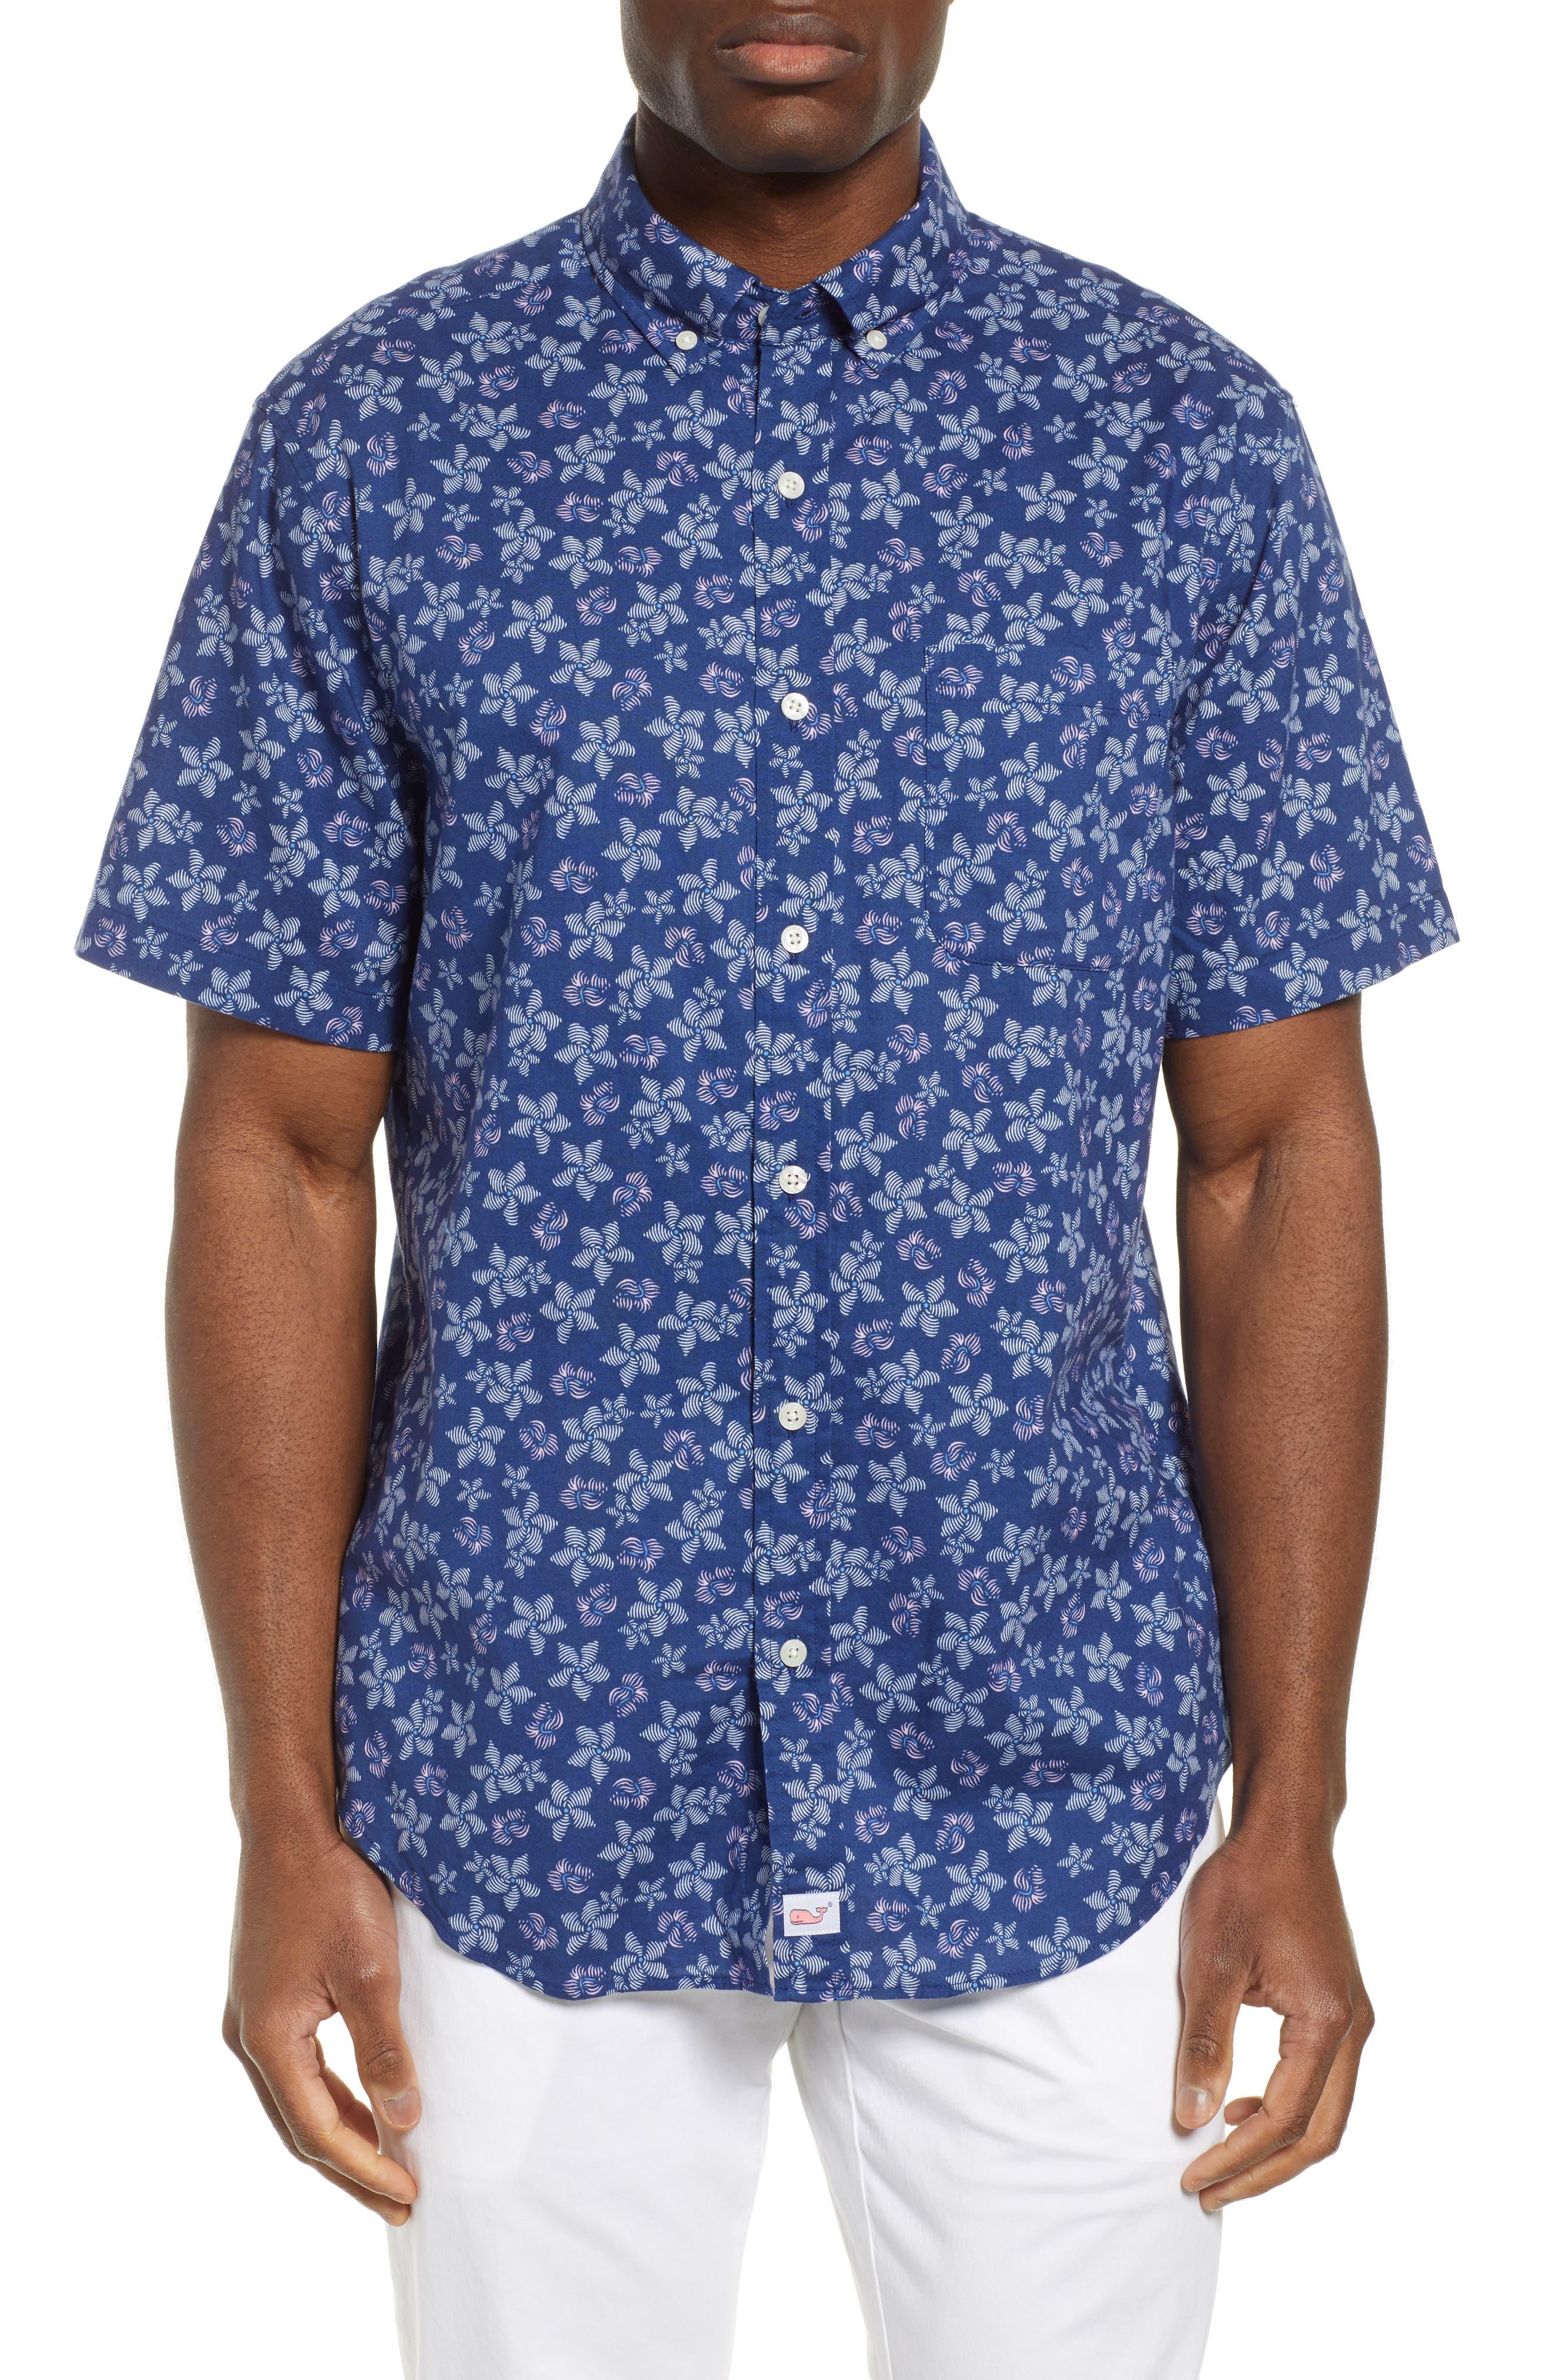 VINEYARD VINES Murray Slim Fit Floral Print Sport Shirt, Main, color, DEEP BAY